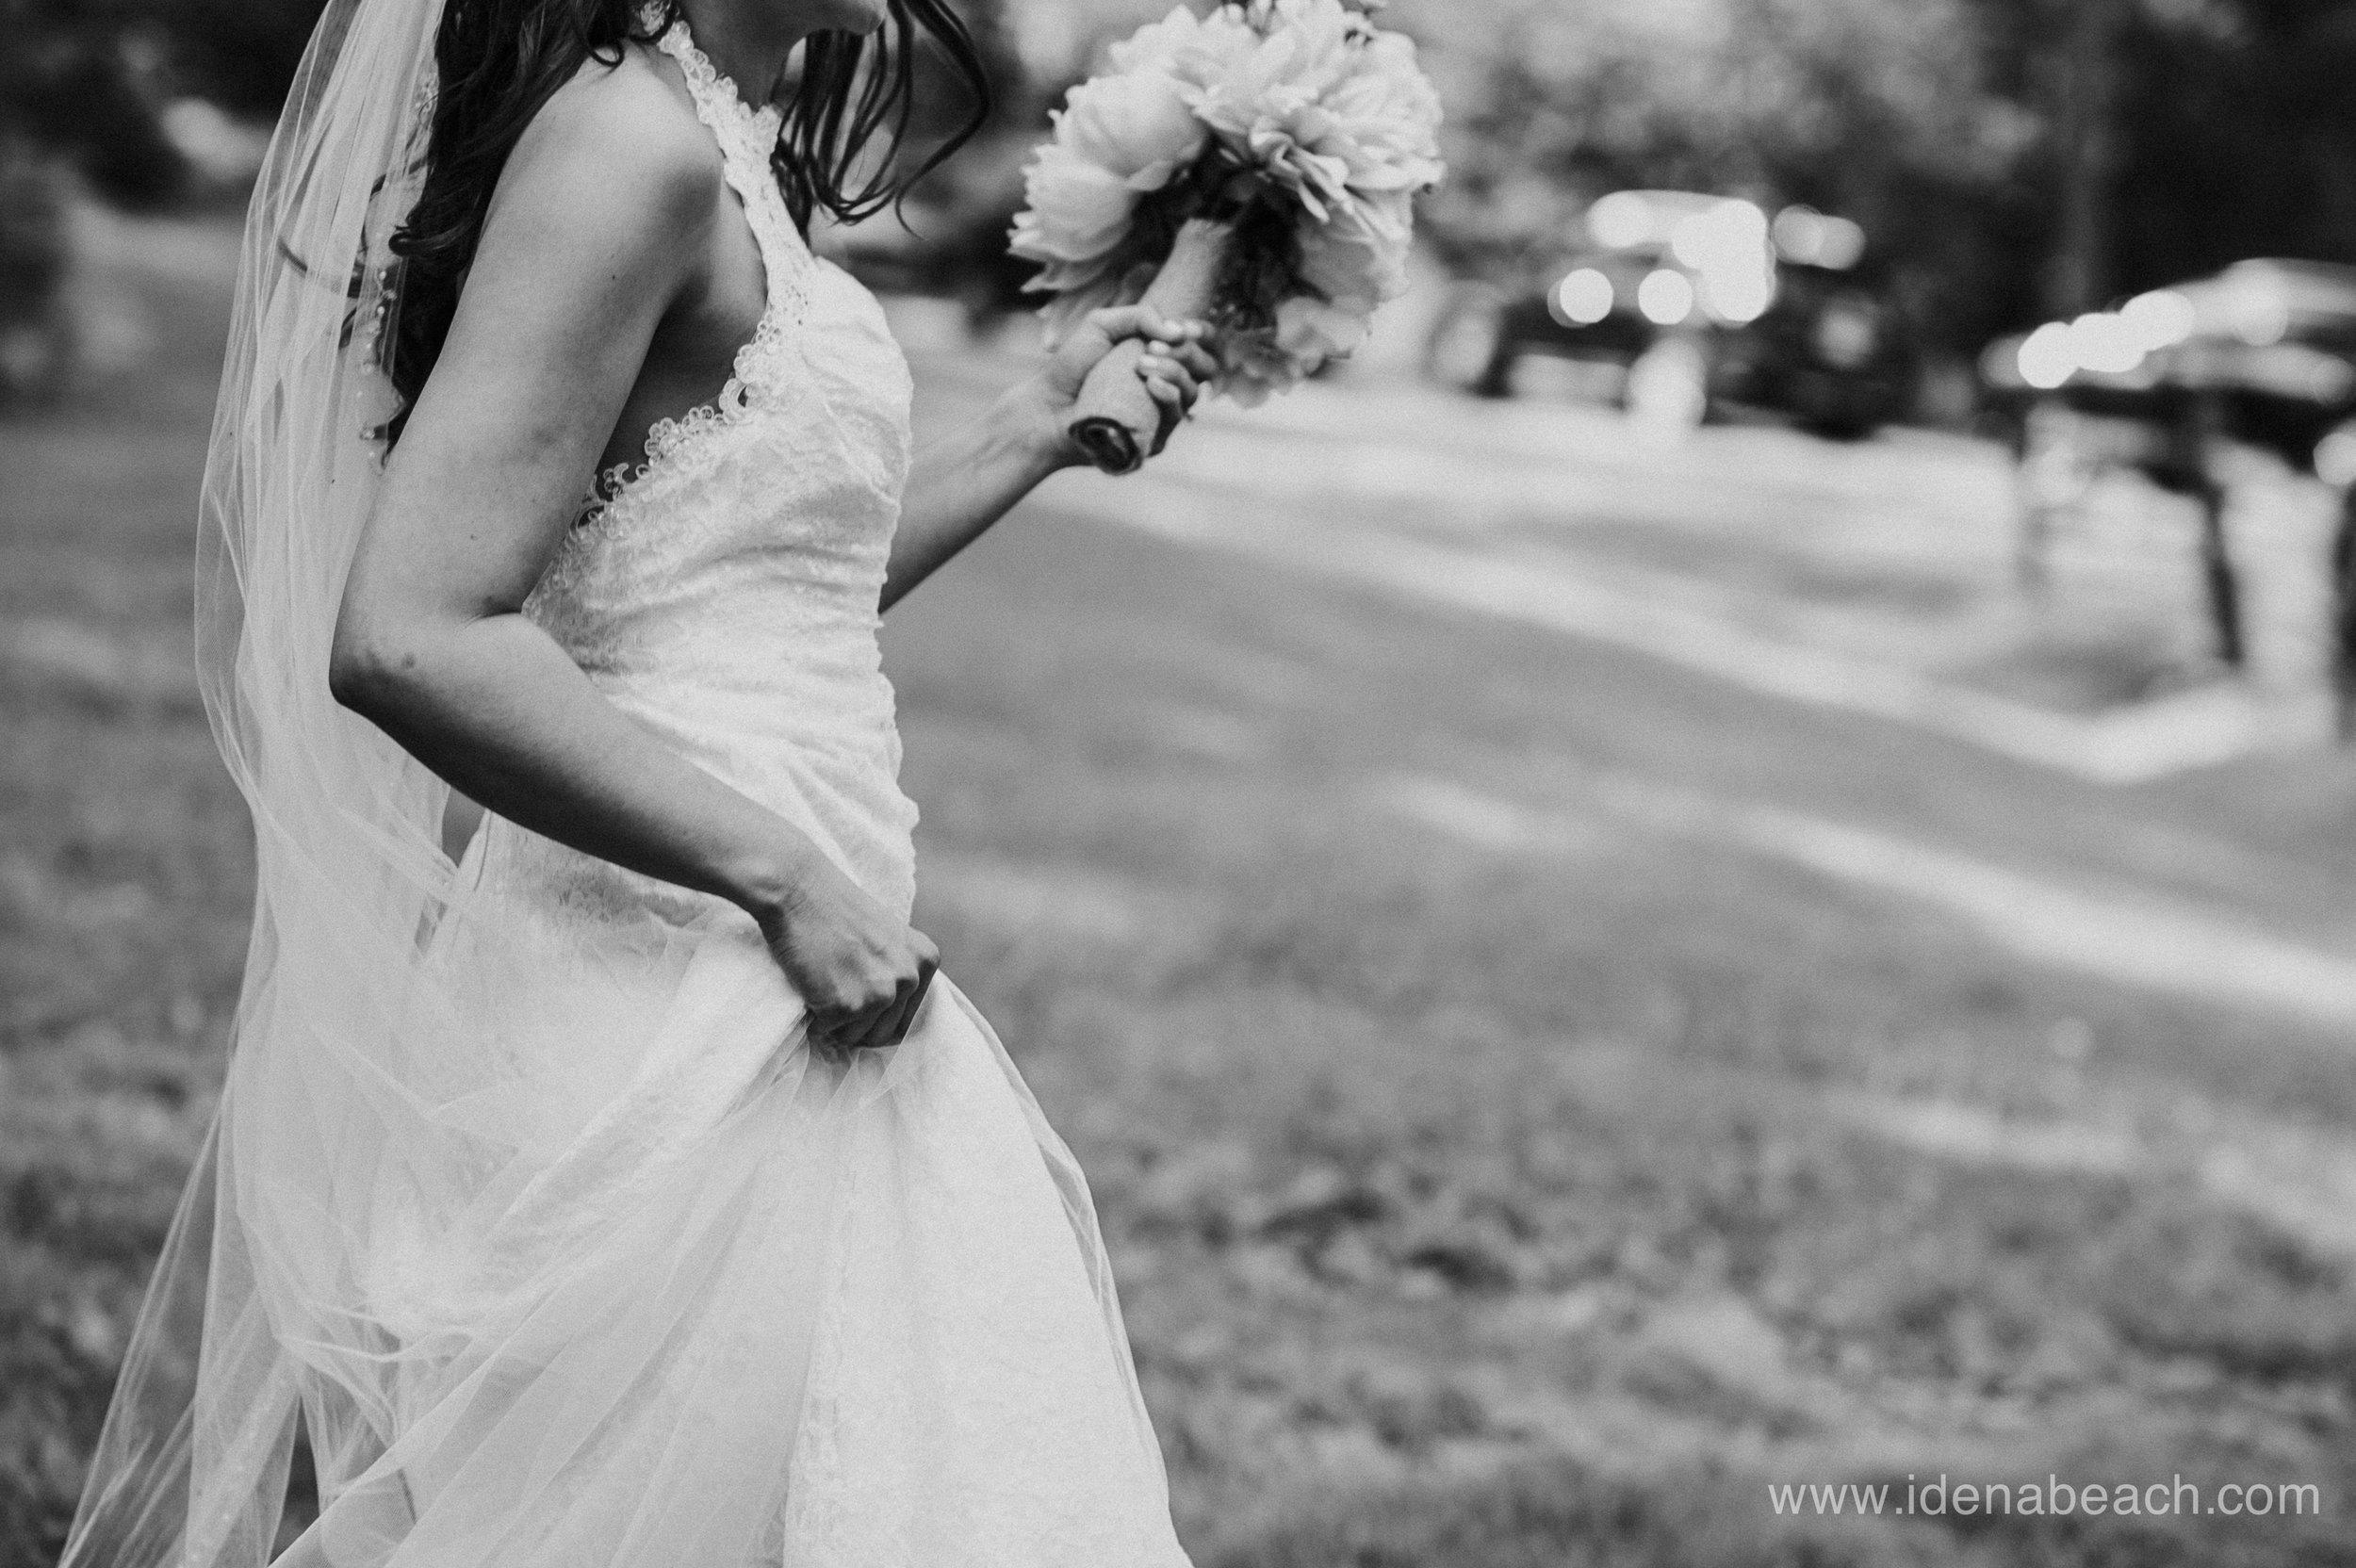 Mountain-Top-Inn-Vermont-Wedding-Photographer-33.jpg